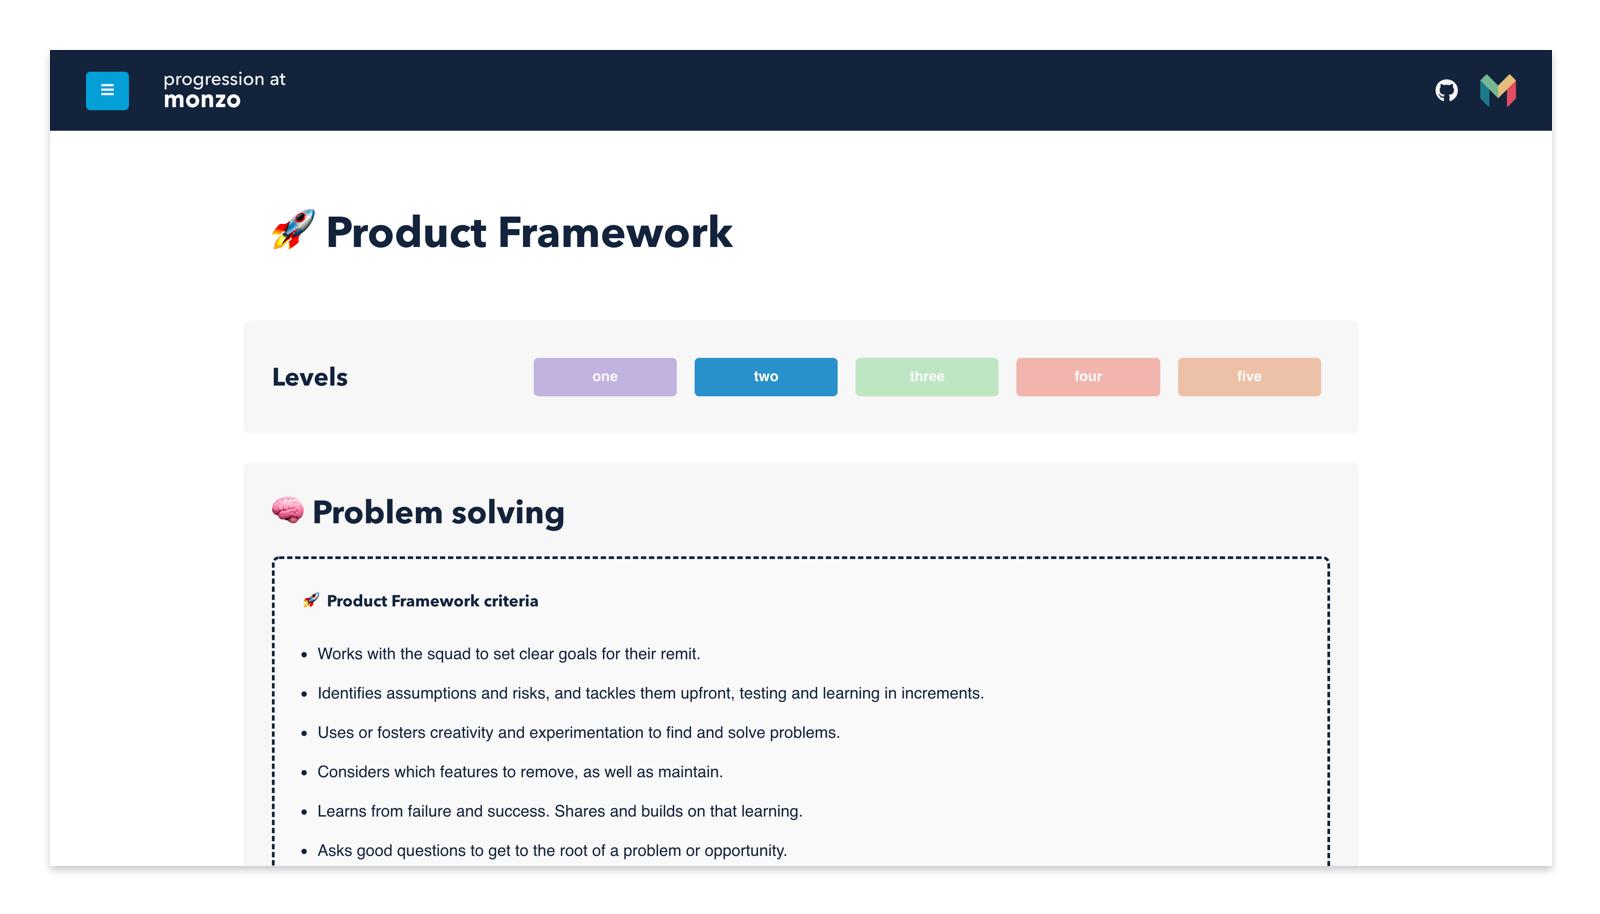 Screenshot of the progression framework website